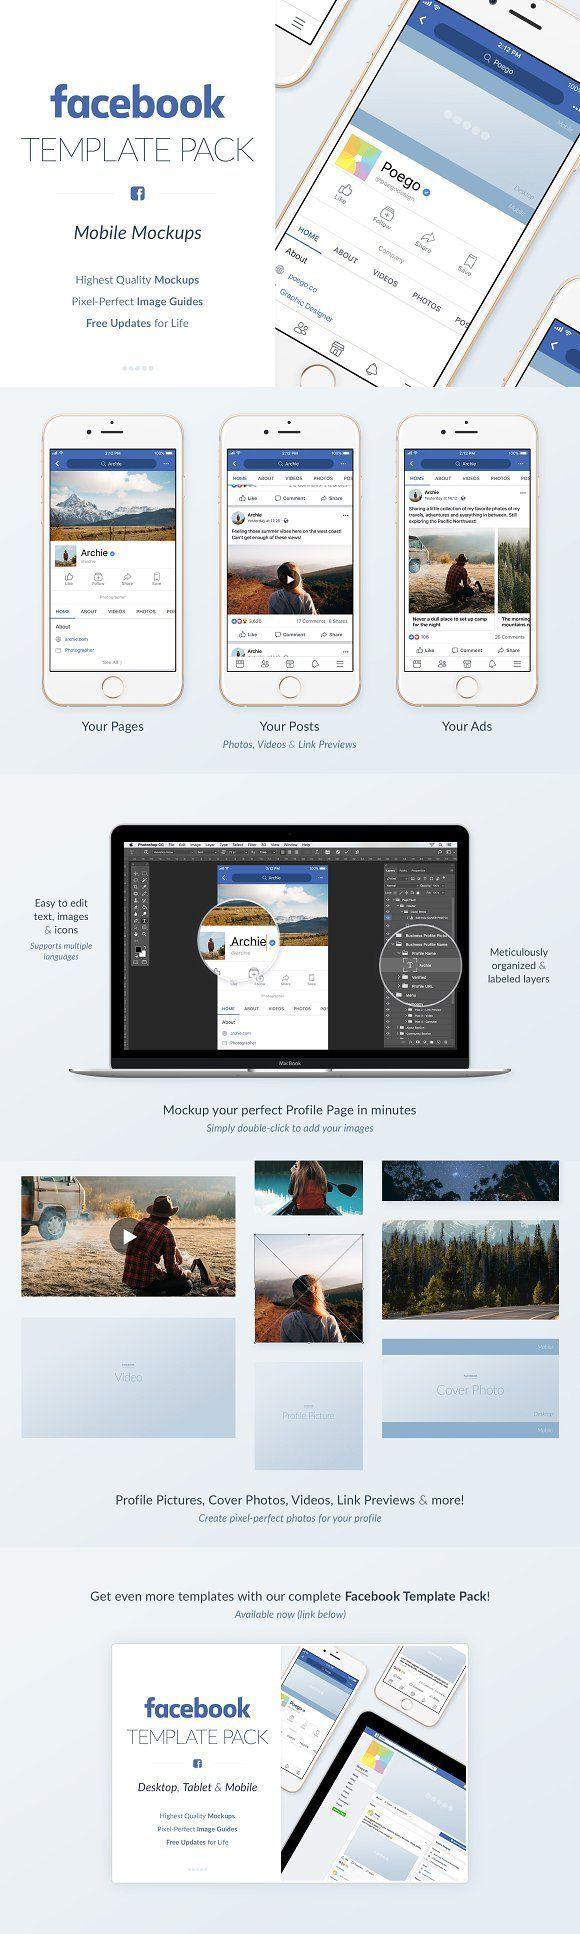 Facebook Mobile Mockups Pack Mockup Social Media Template And